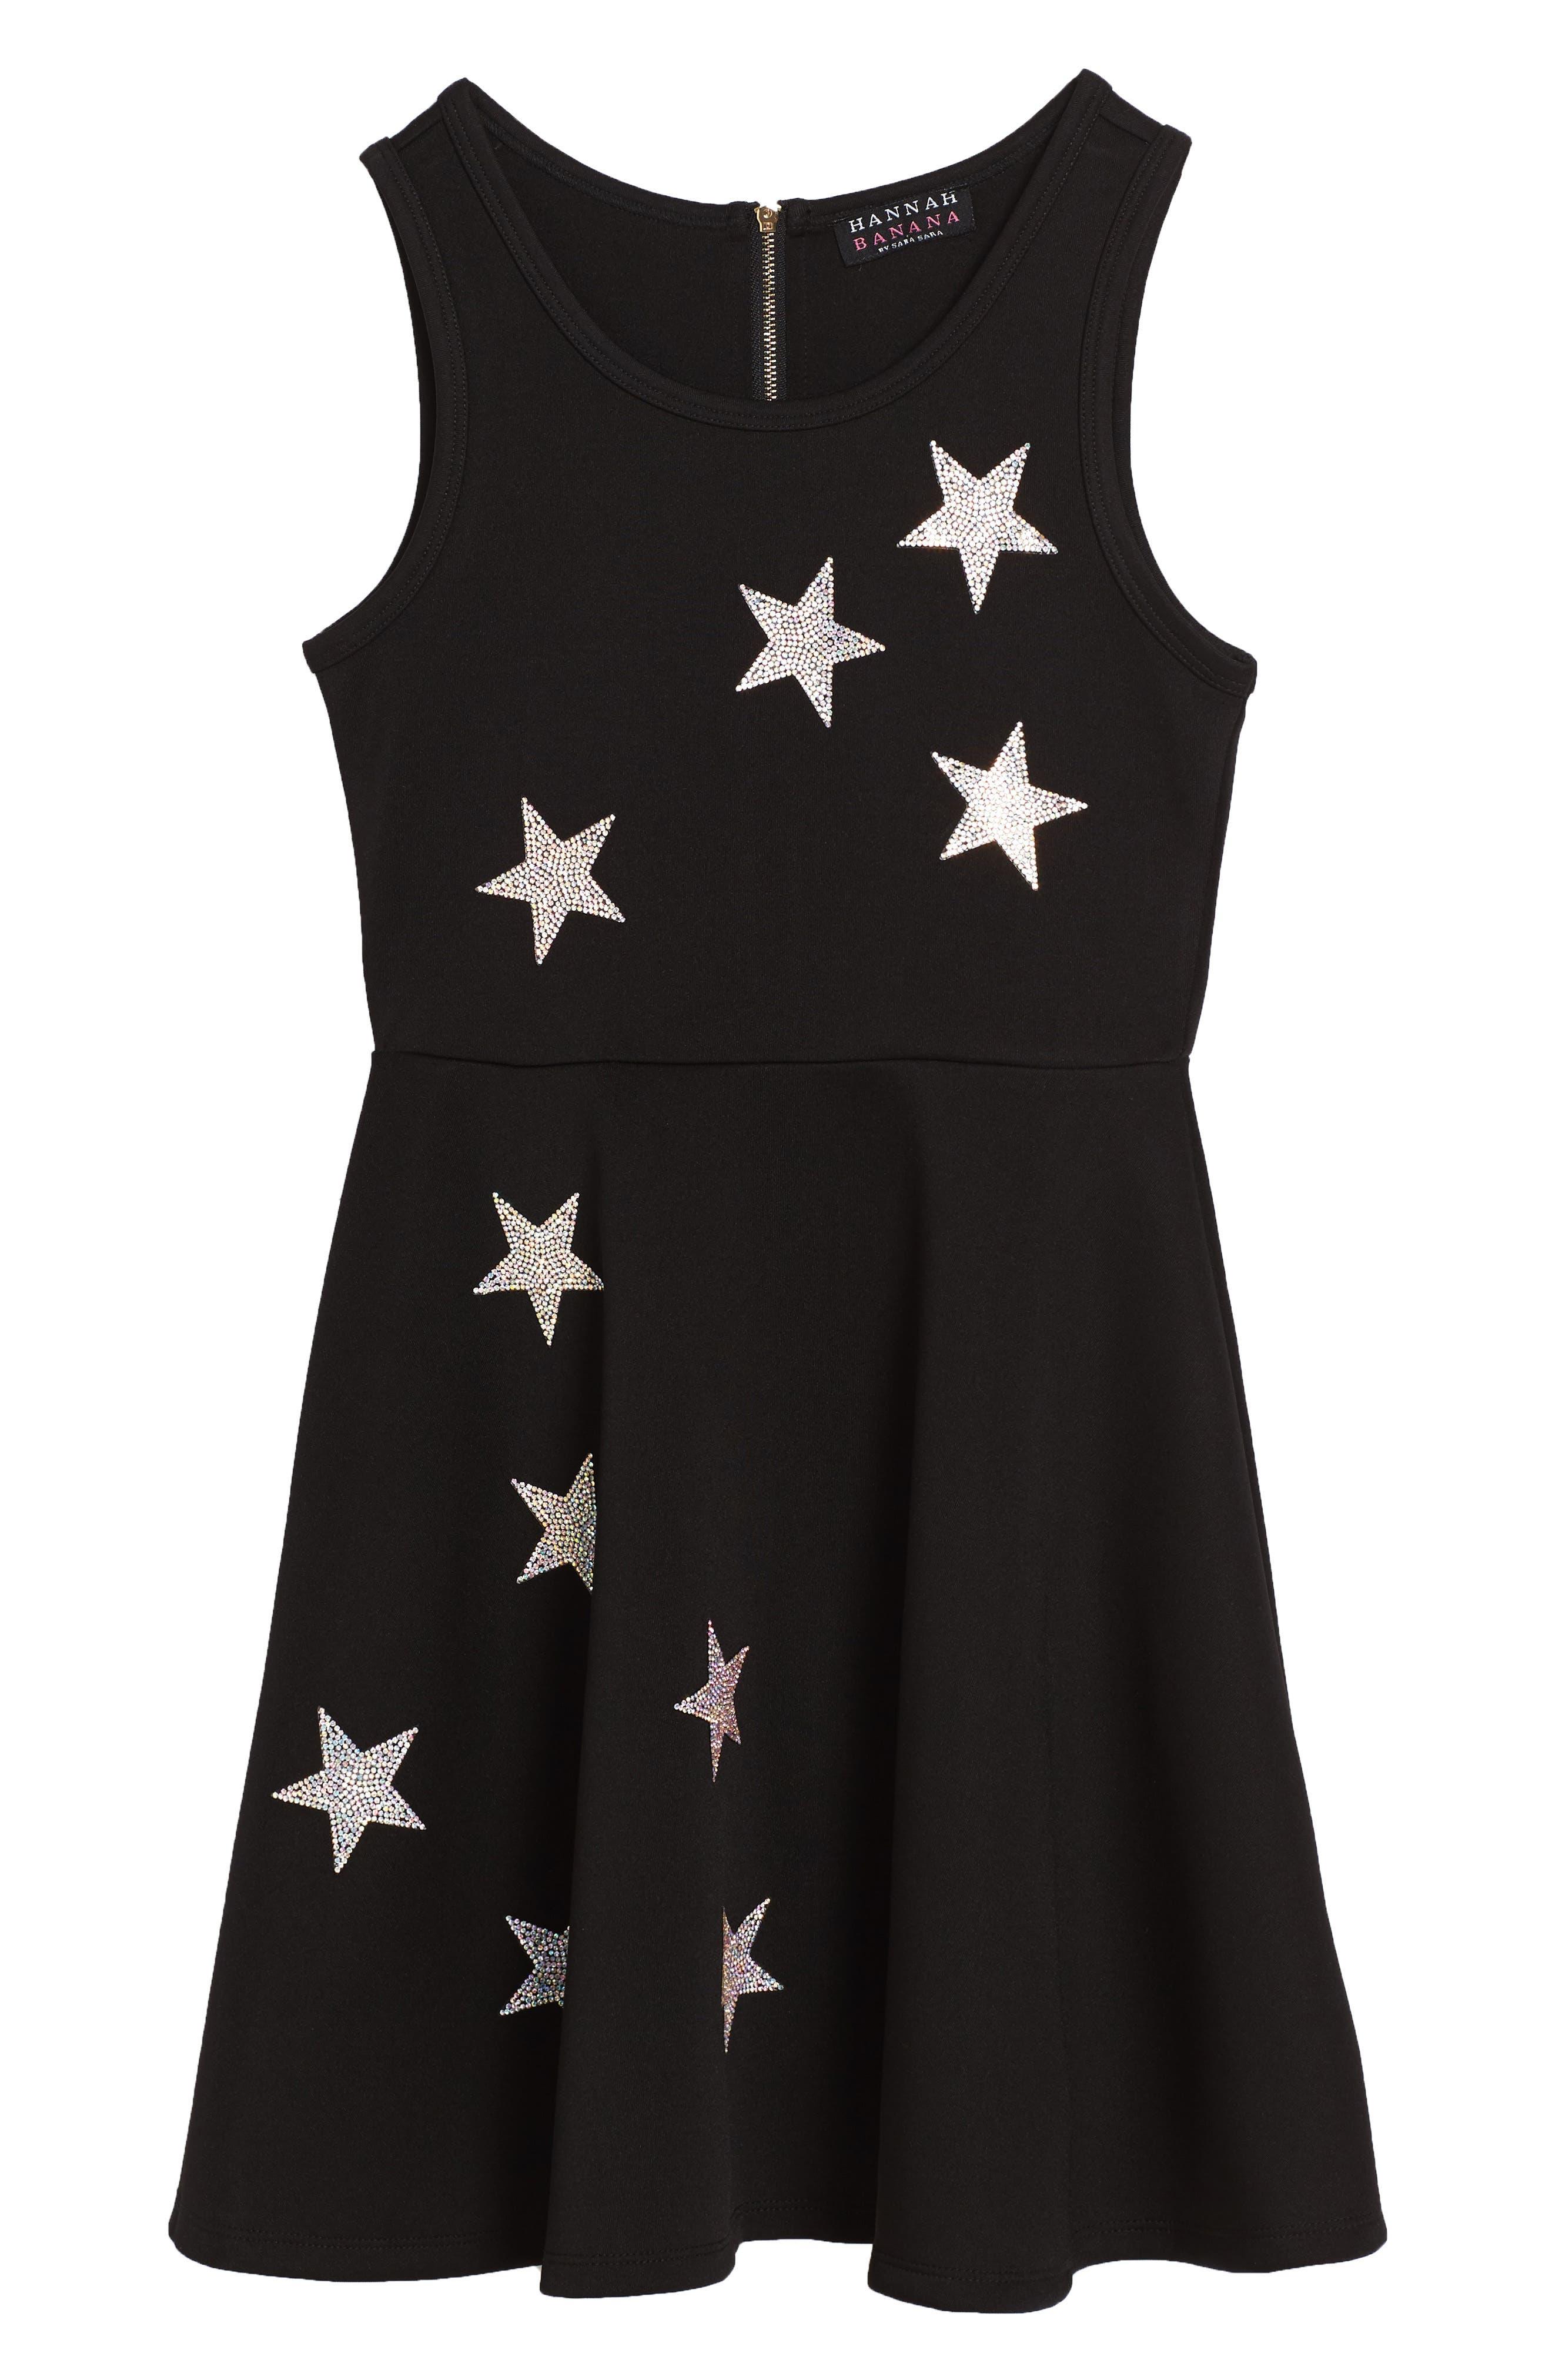 Main Image - Hannah Banana Star Embellished Dress (Big Girls)